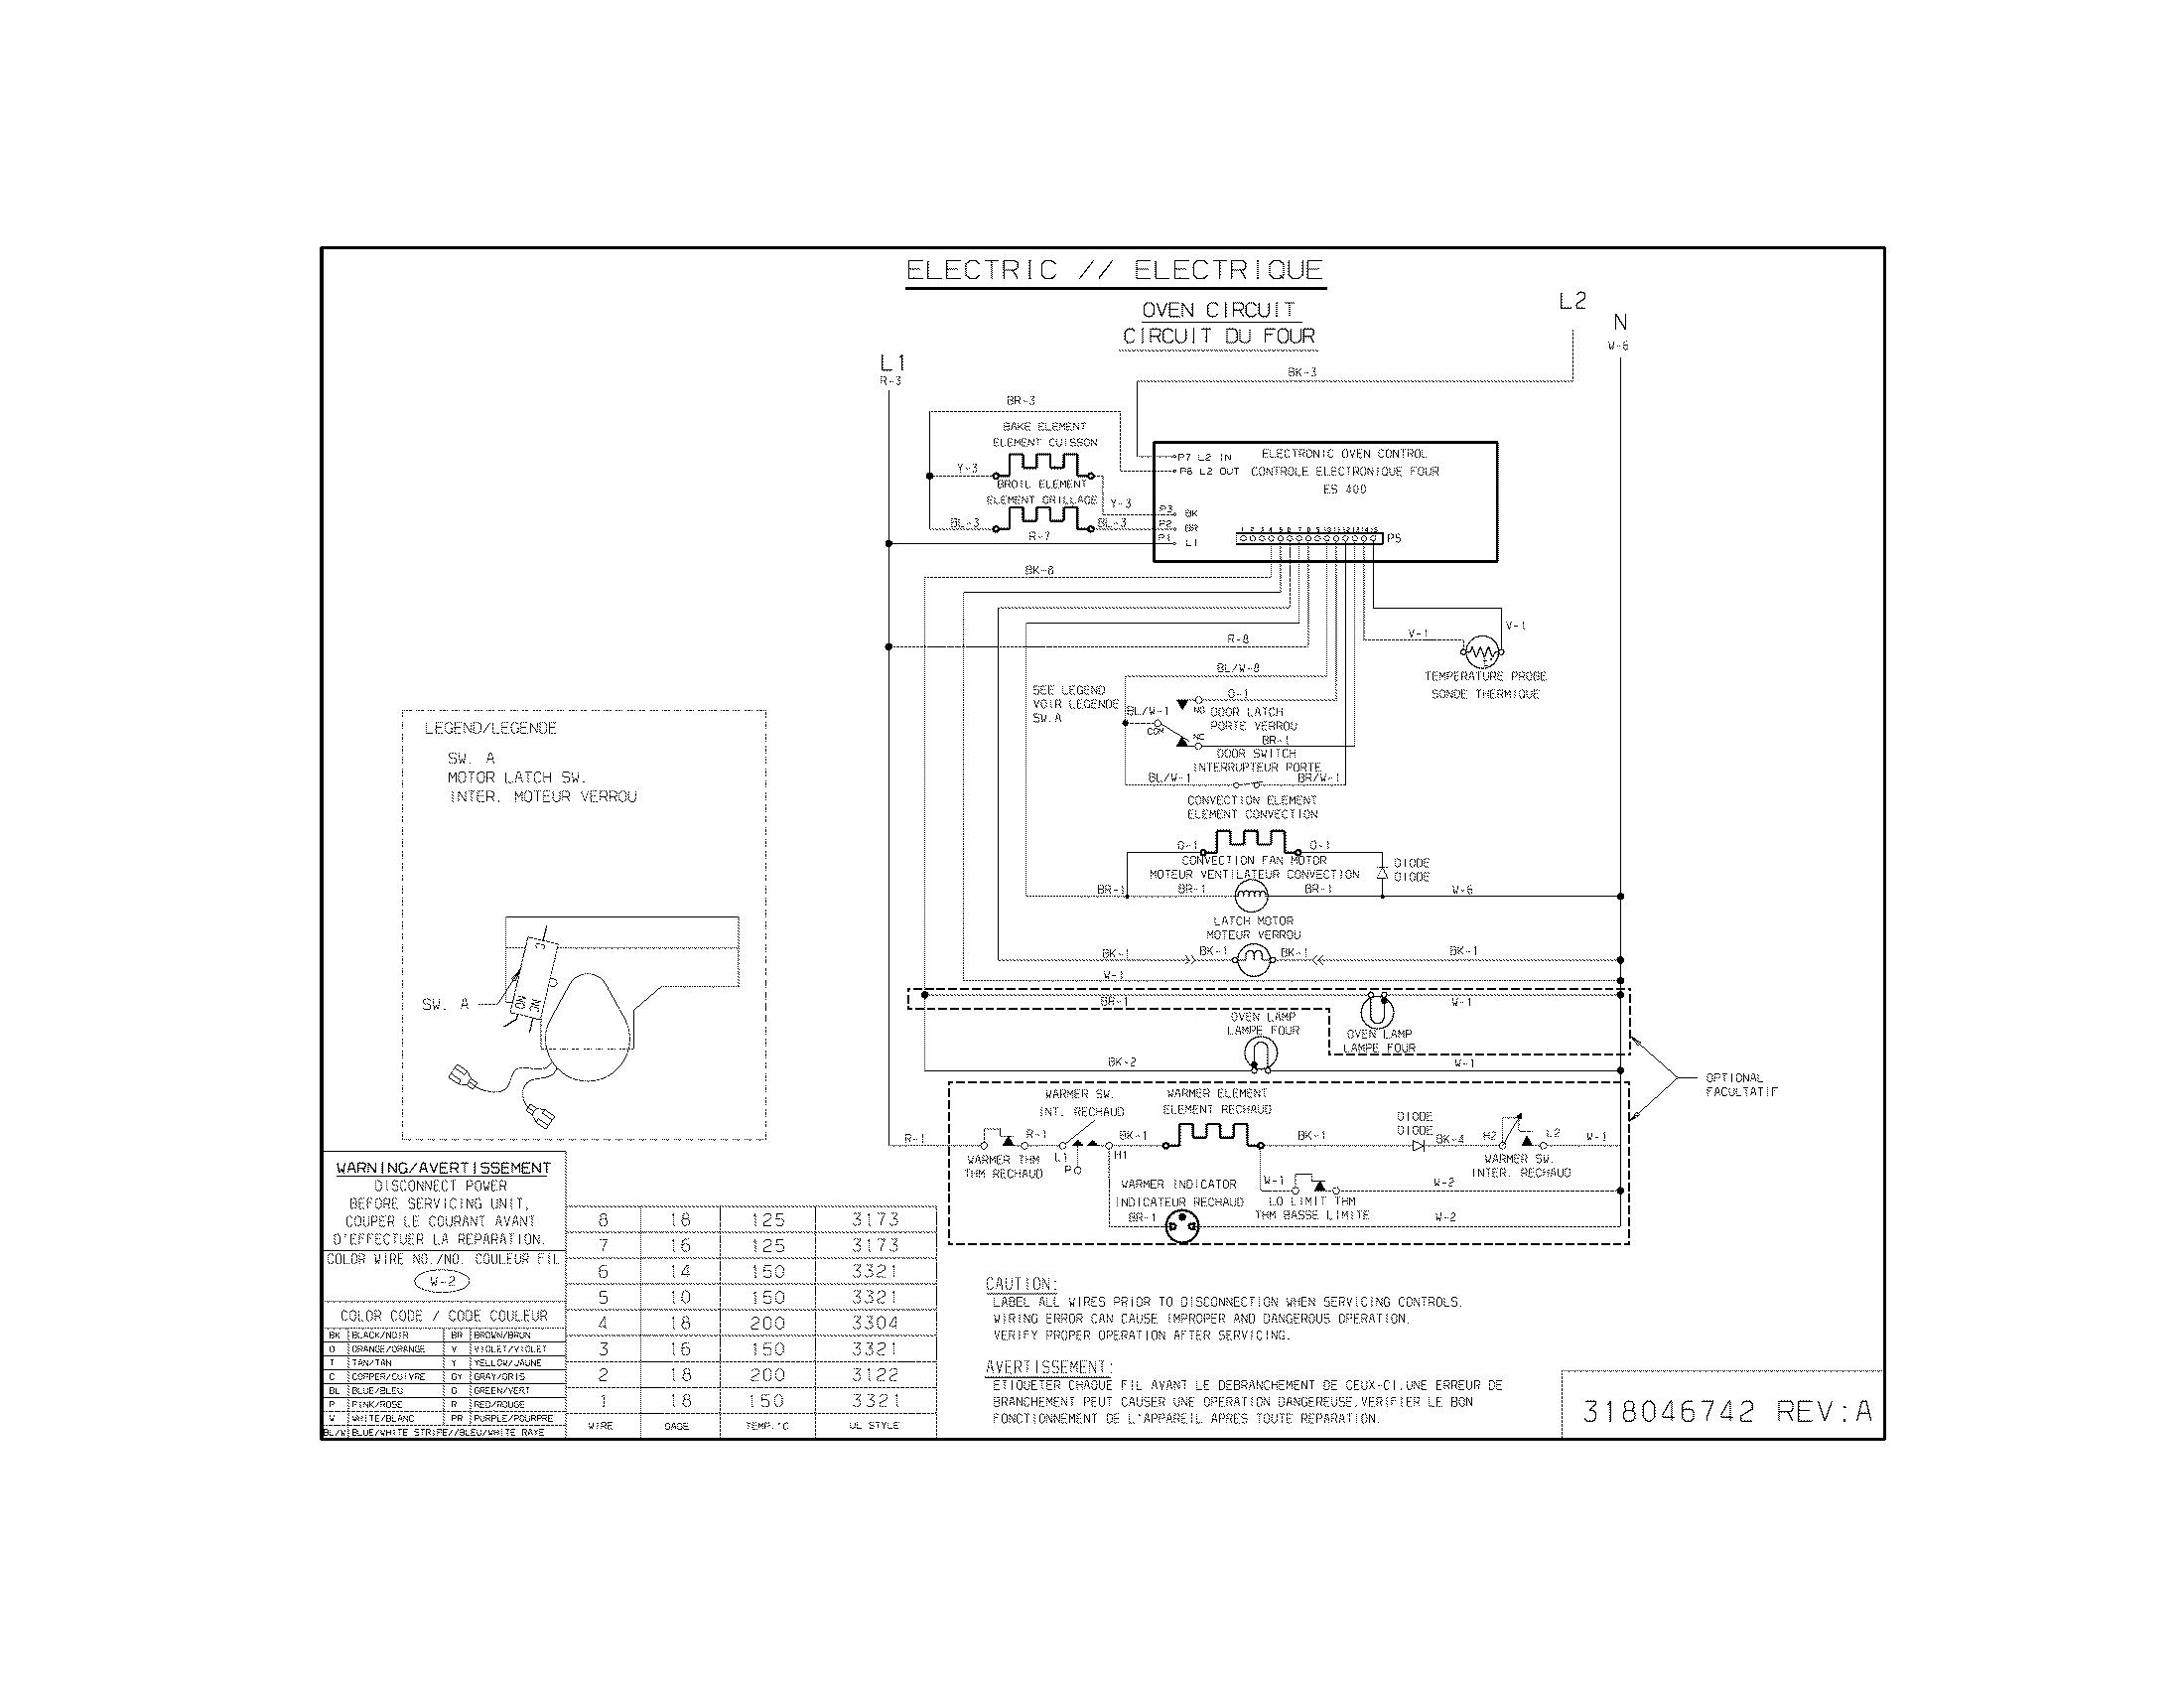 Cv 0538 Wiring Diagram Electric Stove